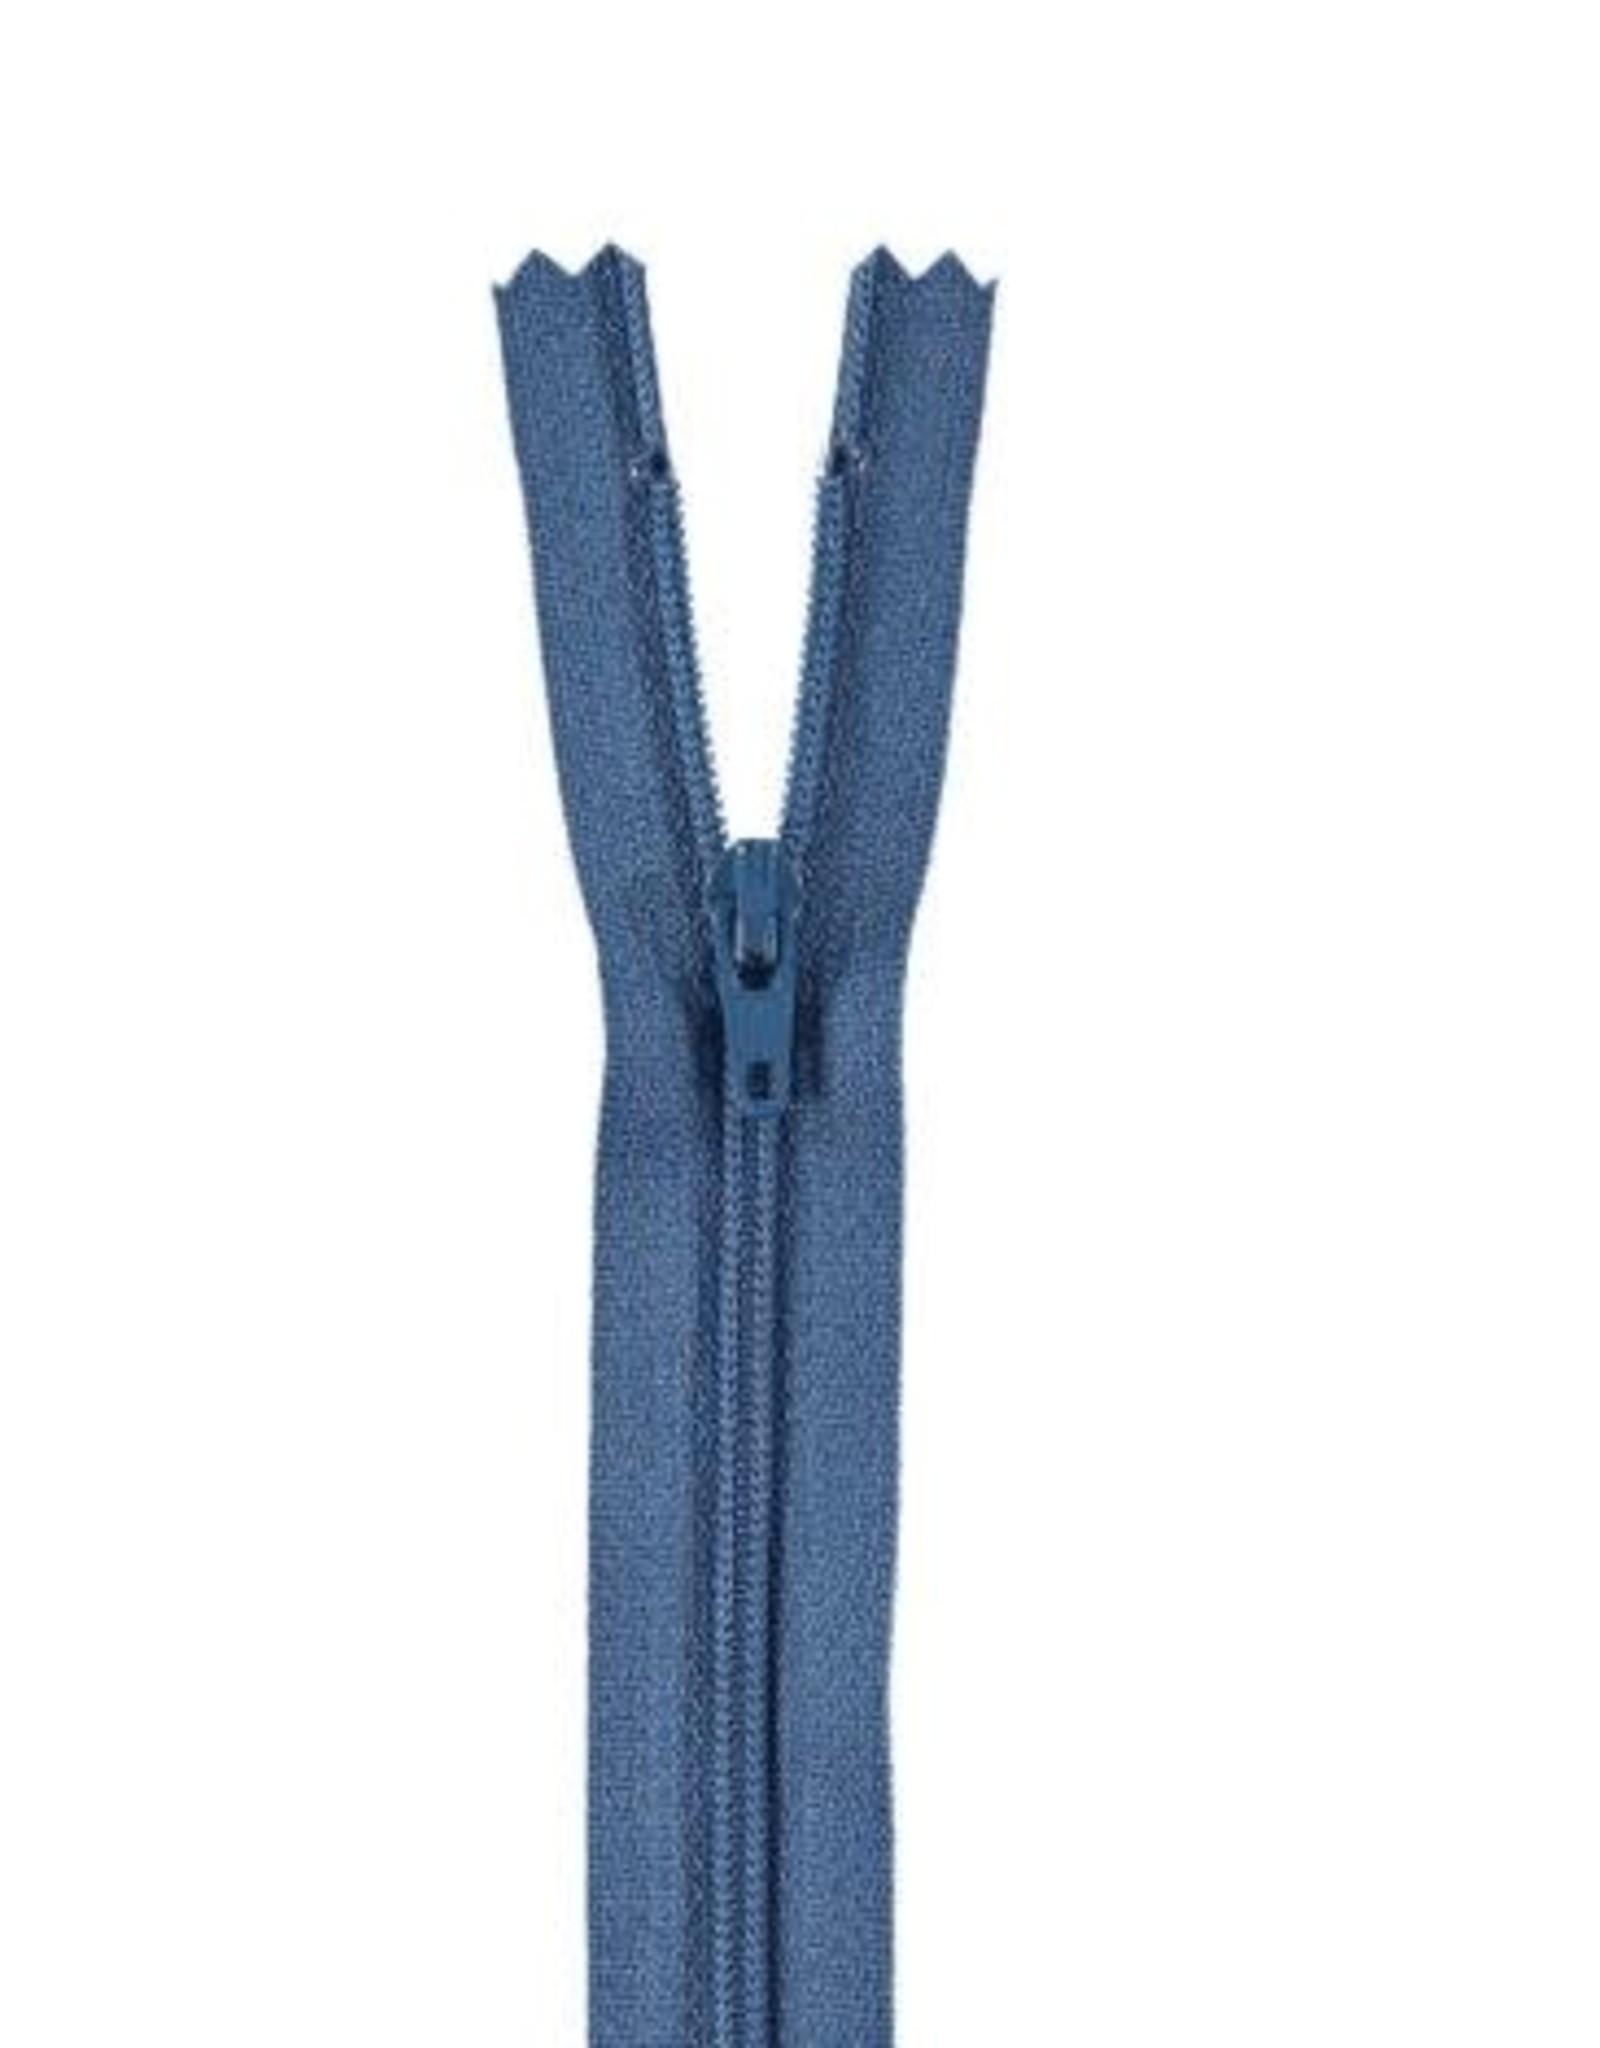 YKK Spiraalrits niet-DB 3mm jeansblauw 839-55cm